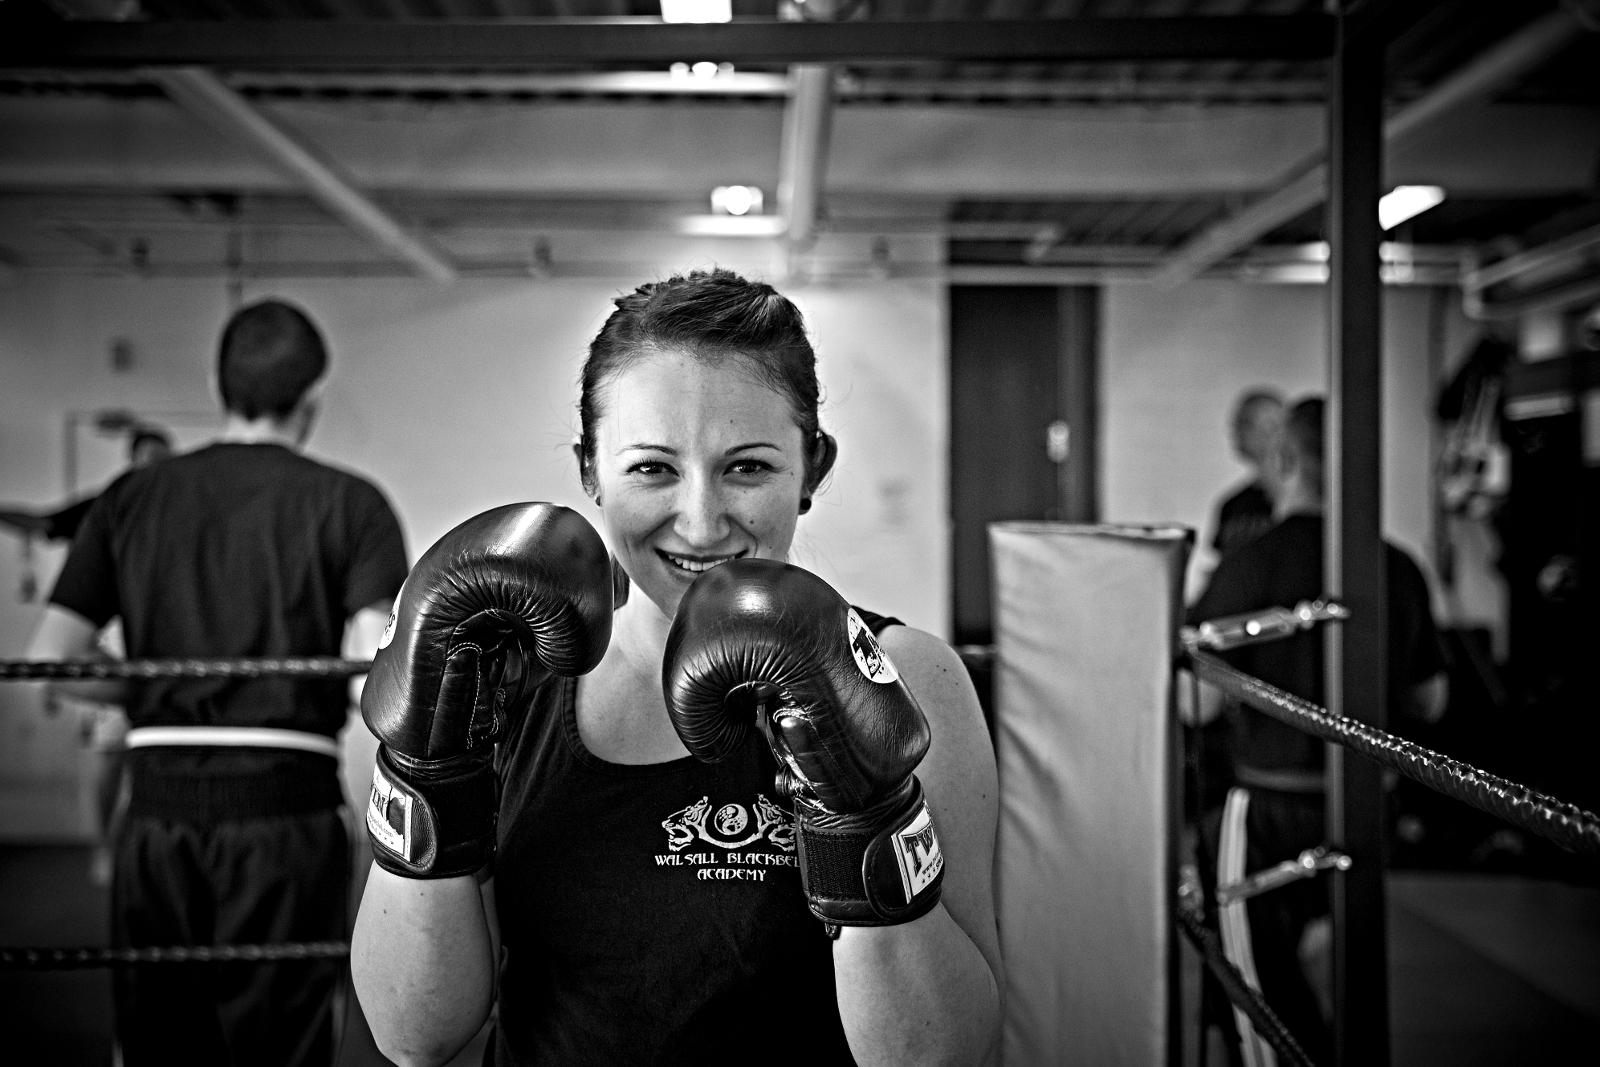 Laura Pascall - Current grade – Black belt 2nd dan